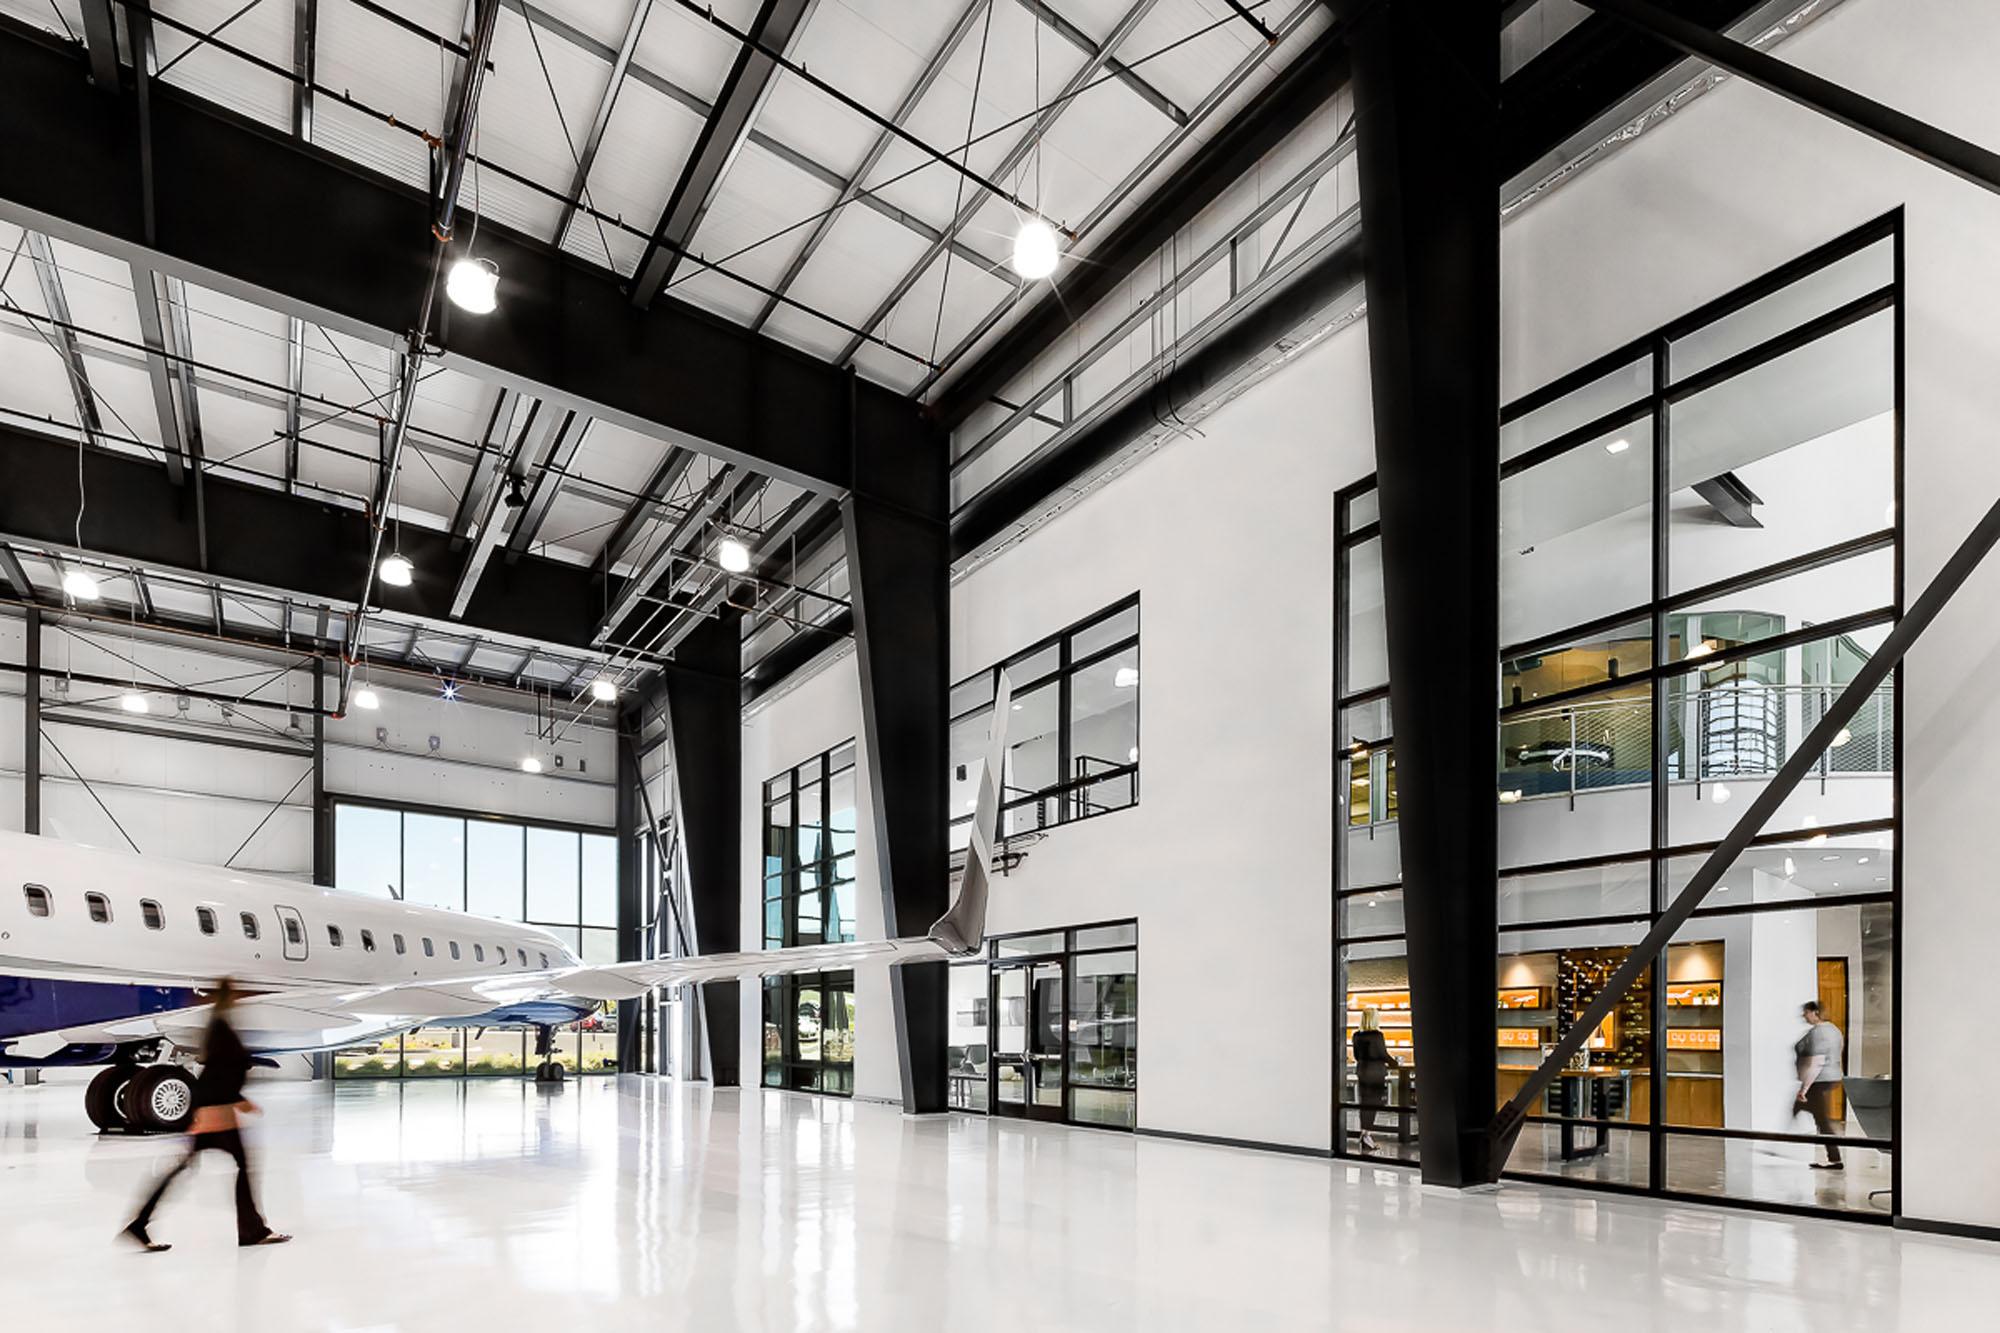 Dexigner: NELSON Worldwide Completes ACI Jet Hangar and Office